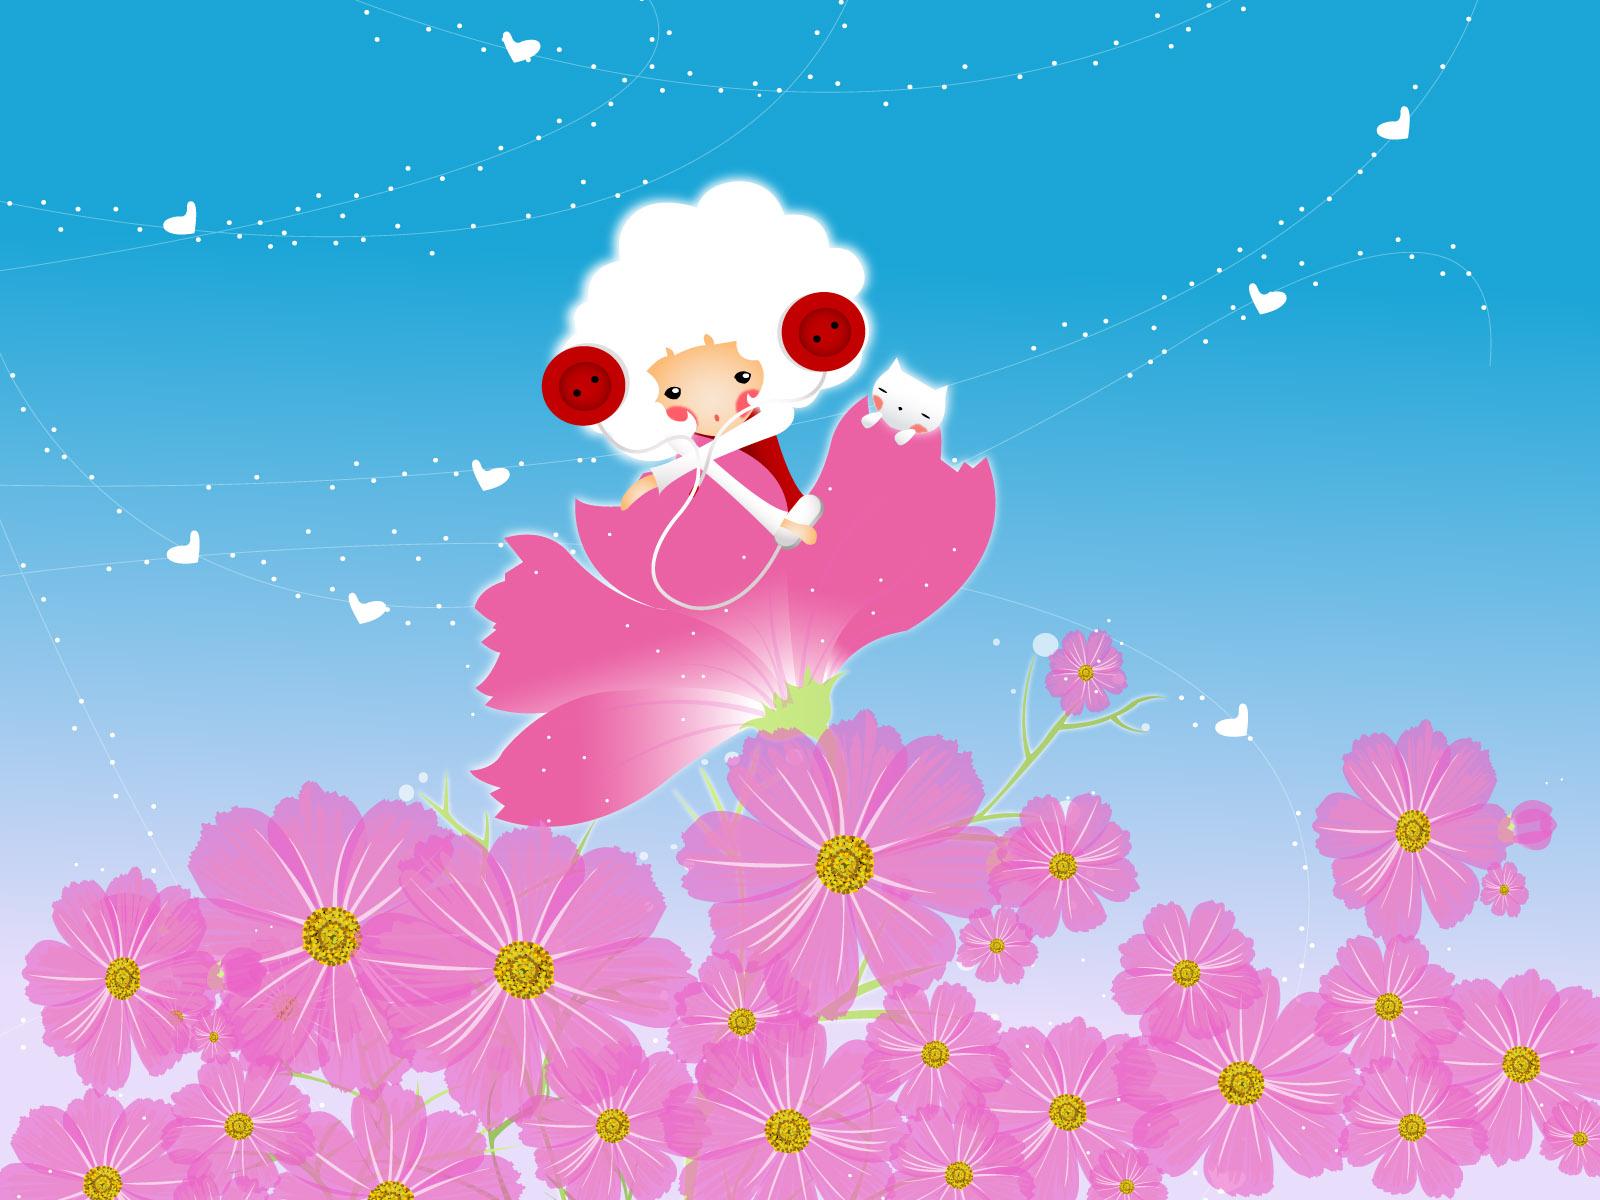 Spring Wallpapers Cute Spring Wallpaper 1600x1200